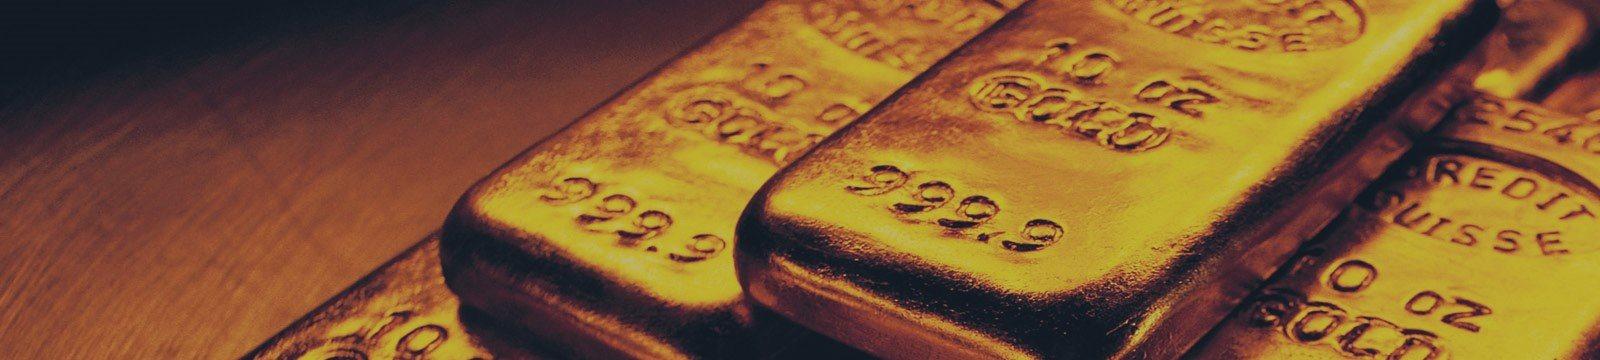 Oro, precios para 16 de abril de 2015, Análisis Técnico